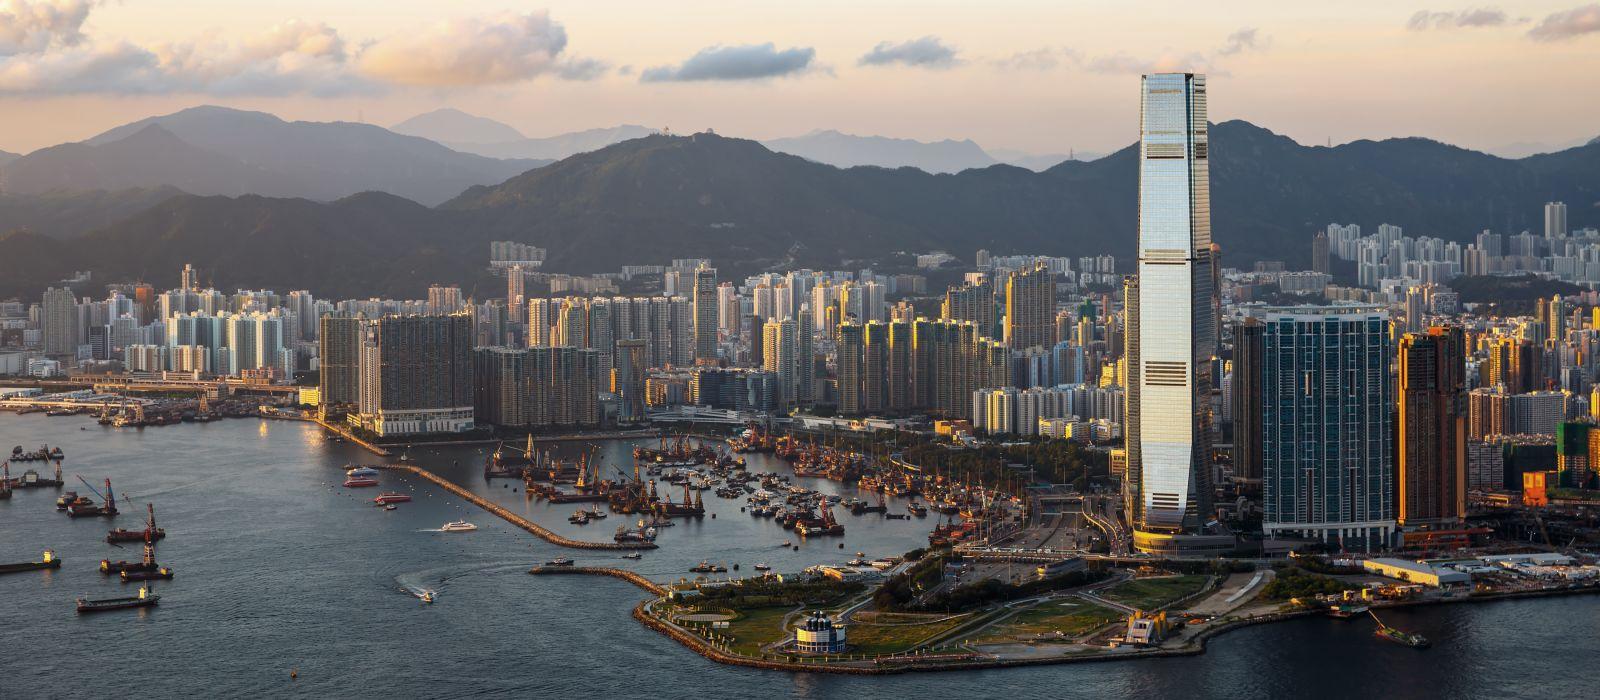 Schöner Sonnenuntergang in West Kowloon, Hongkong, Asien